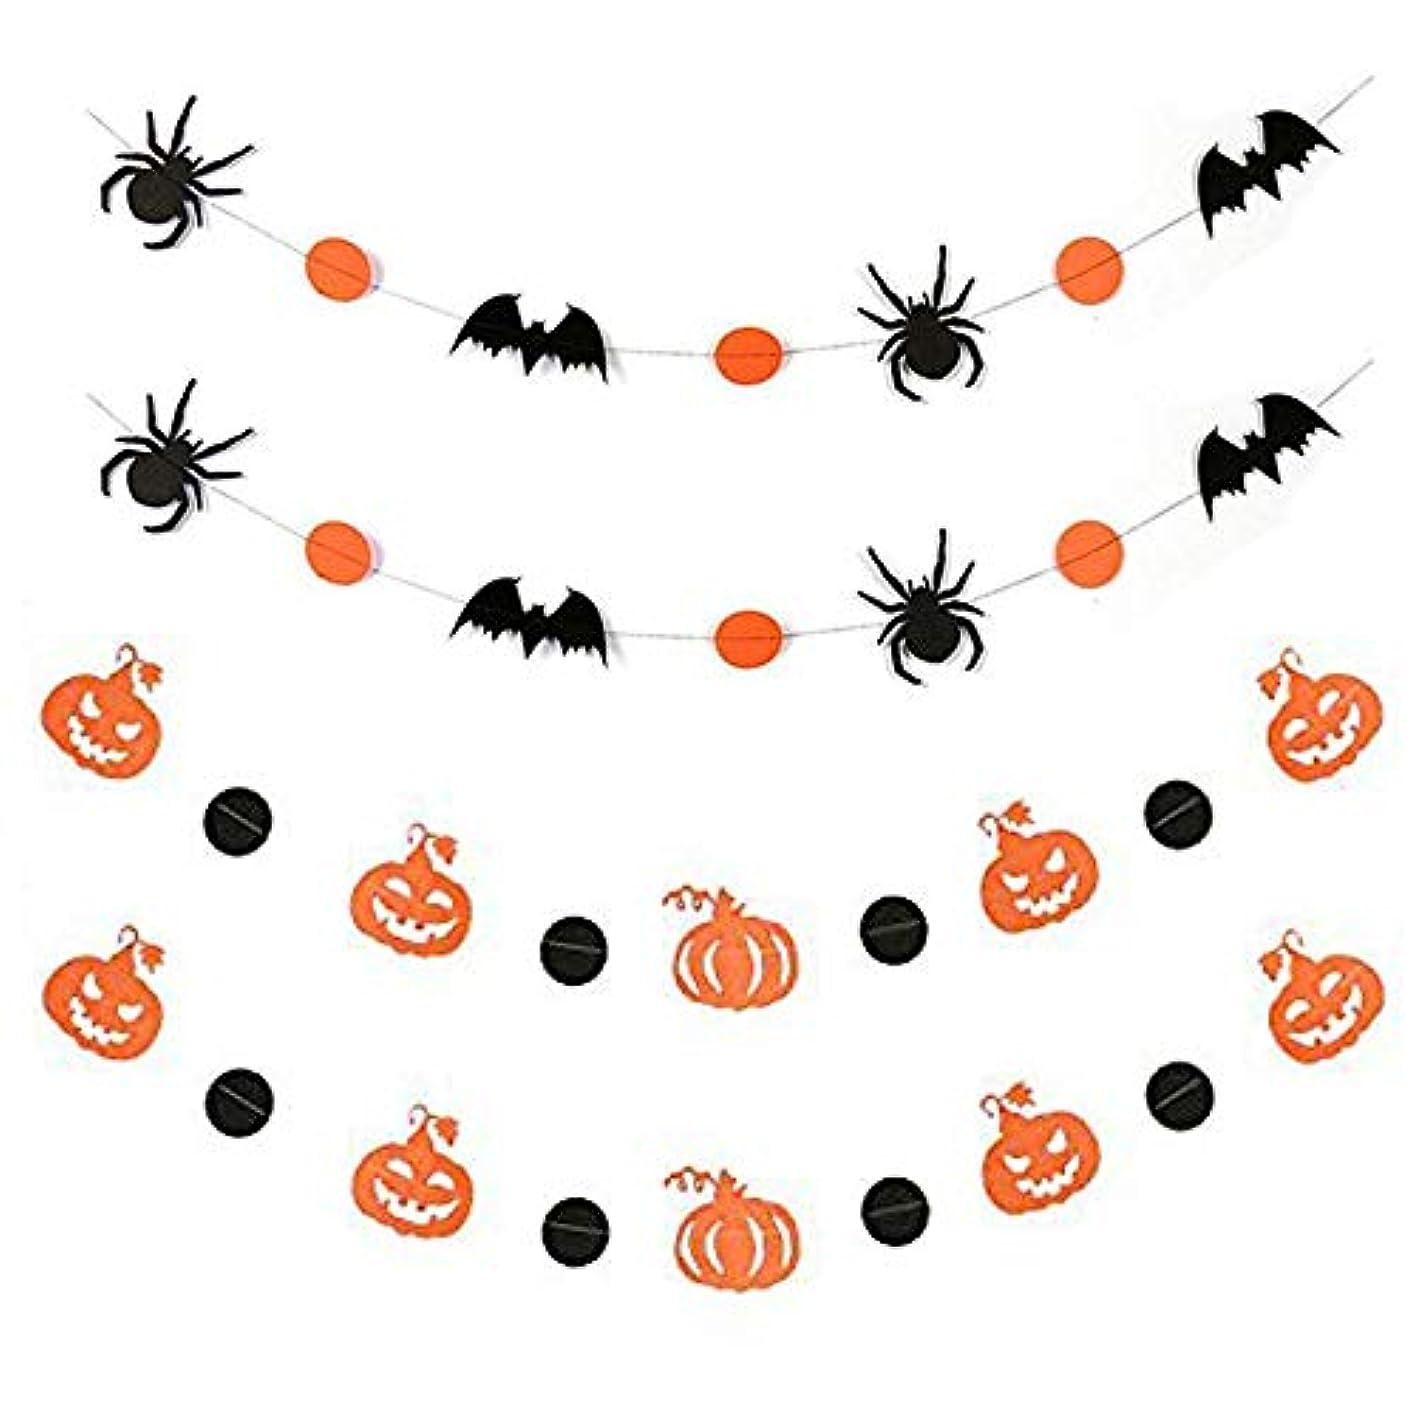 MyRalice 4pcs Halloween Paper Garland Hanging Decorations,Spiders/Bats/Pumpkins-Creepy Indoor Party, Kids Class Room, Haunted House Decor pkarzlnejvh657